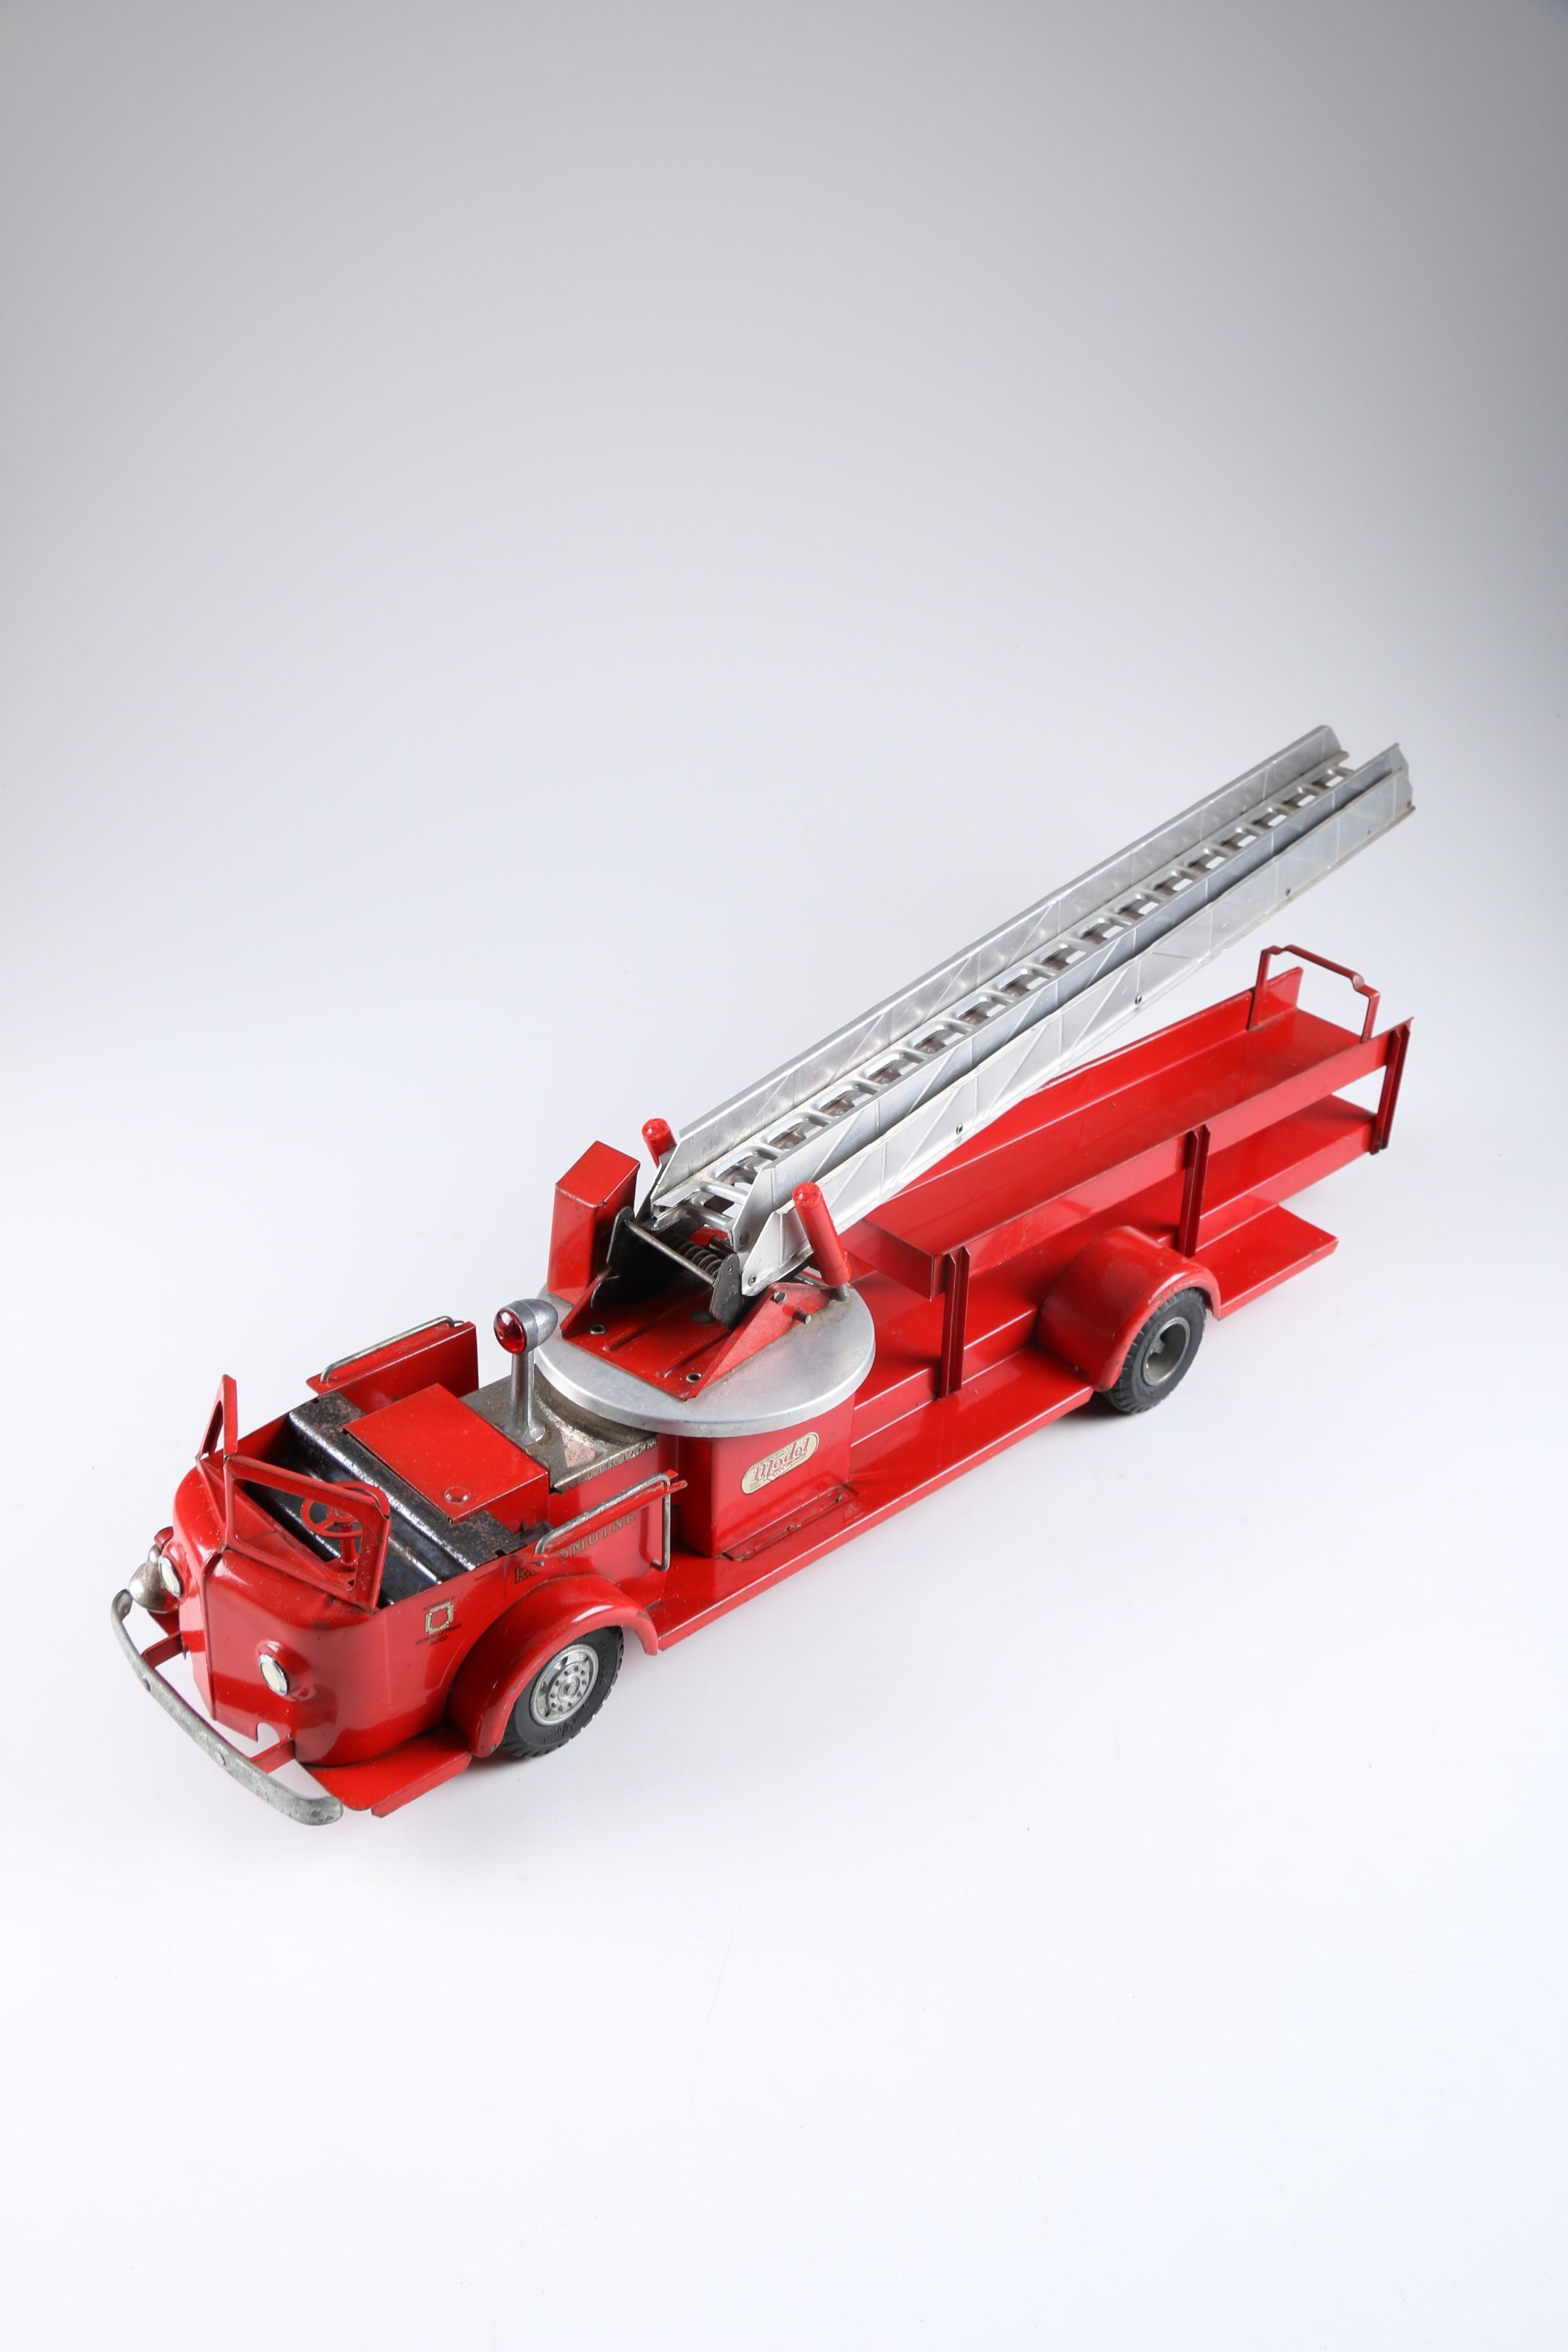 Doepke Model Toys Rossmoyne American LaFrance 1:16 Scale Firetruck